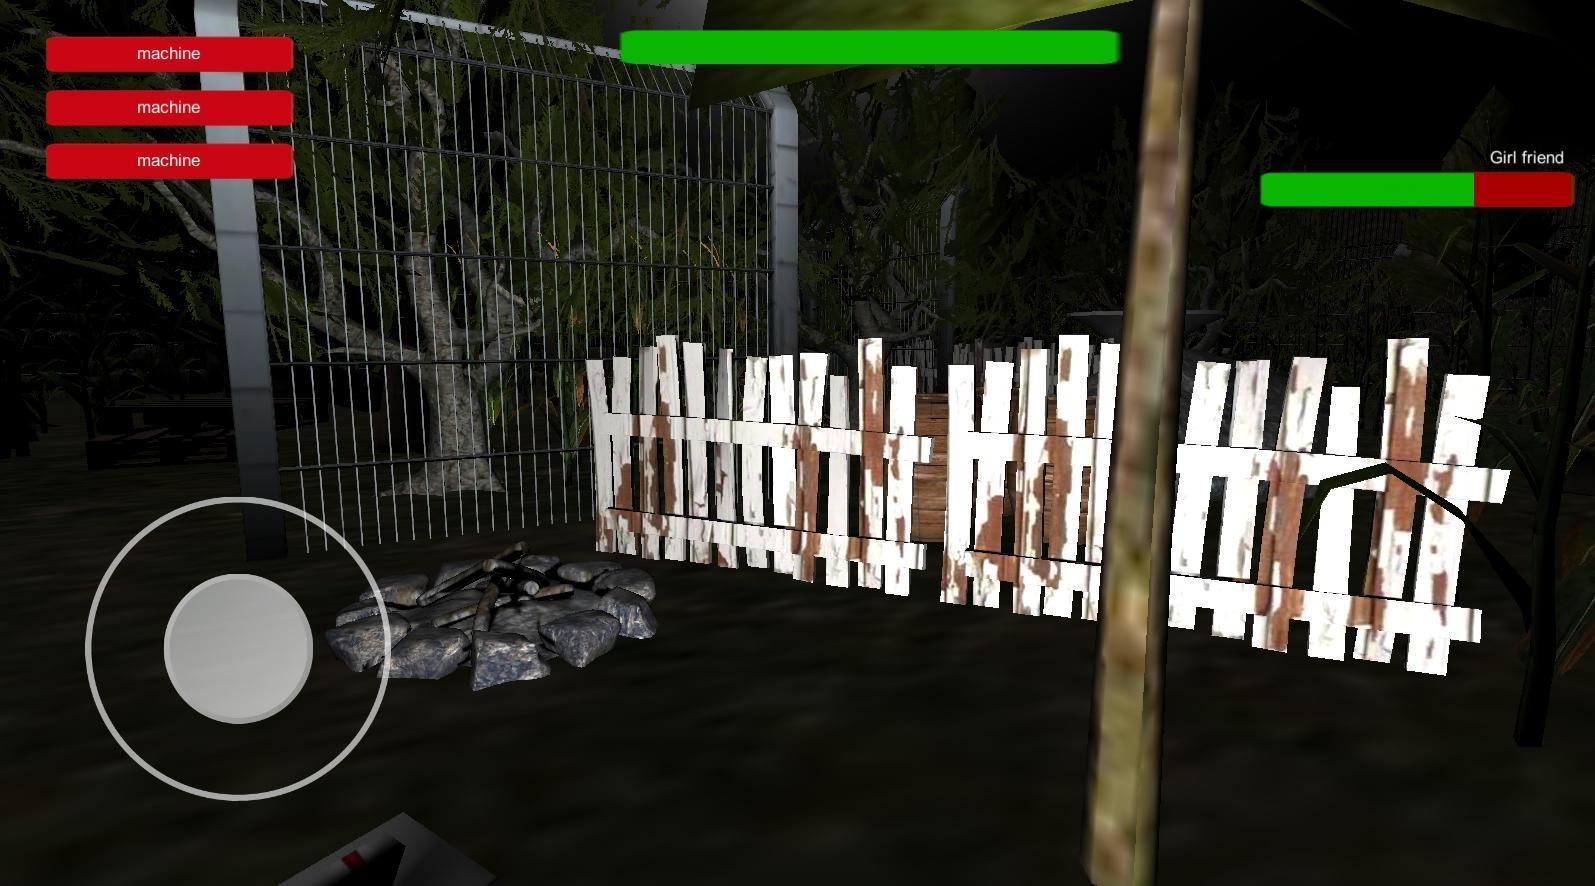 Family Creepy Scary Evil Scream Horror Game 1.6 Screenshot 8